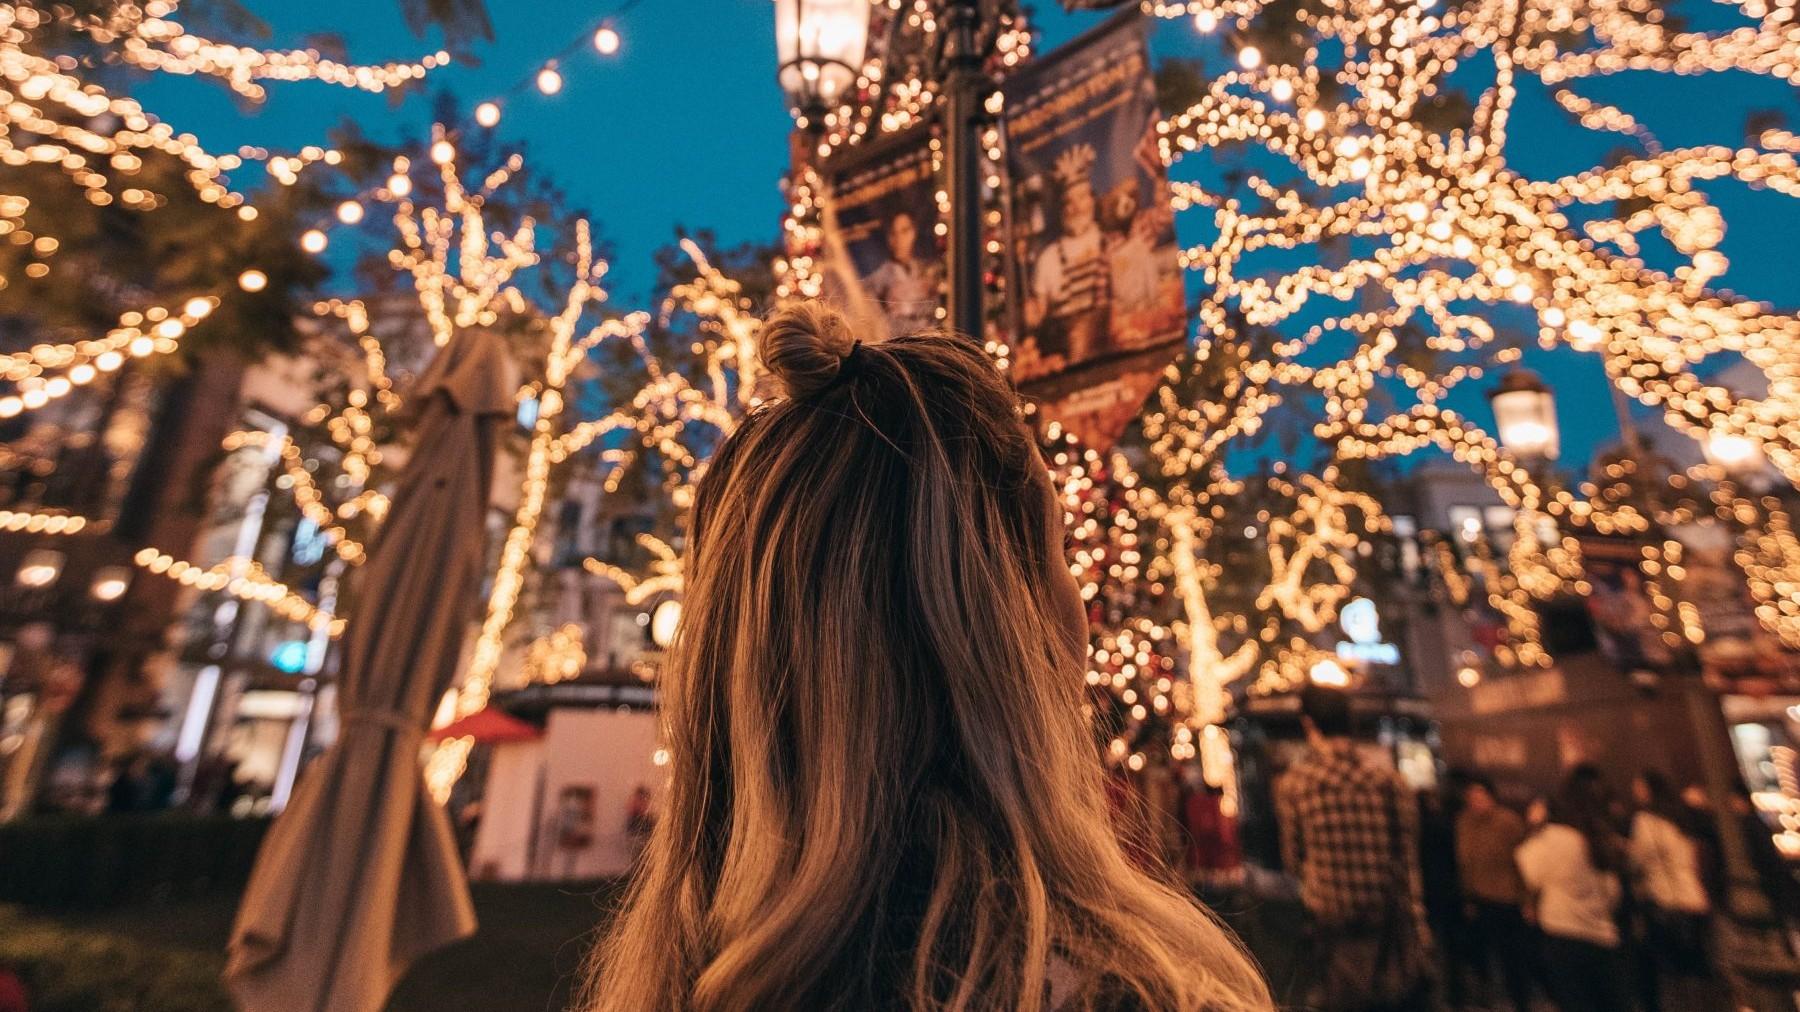 kerstlichtjes, lume, vrouw